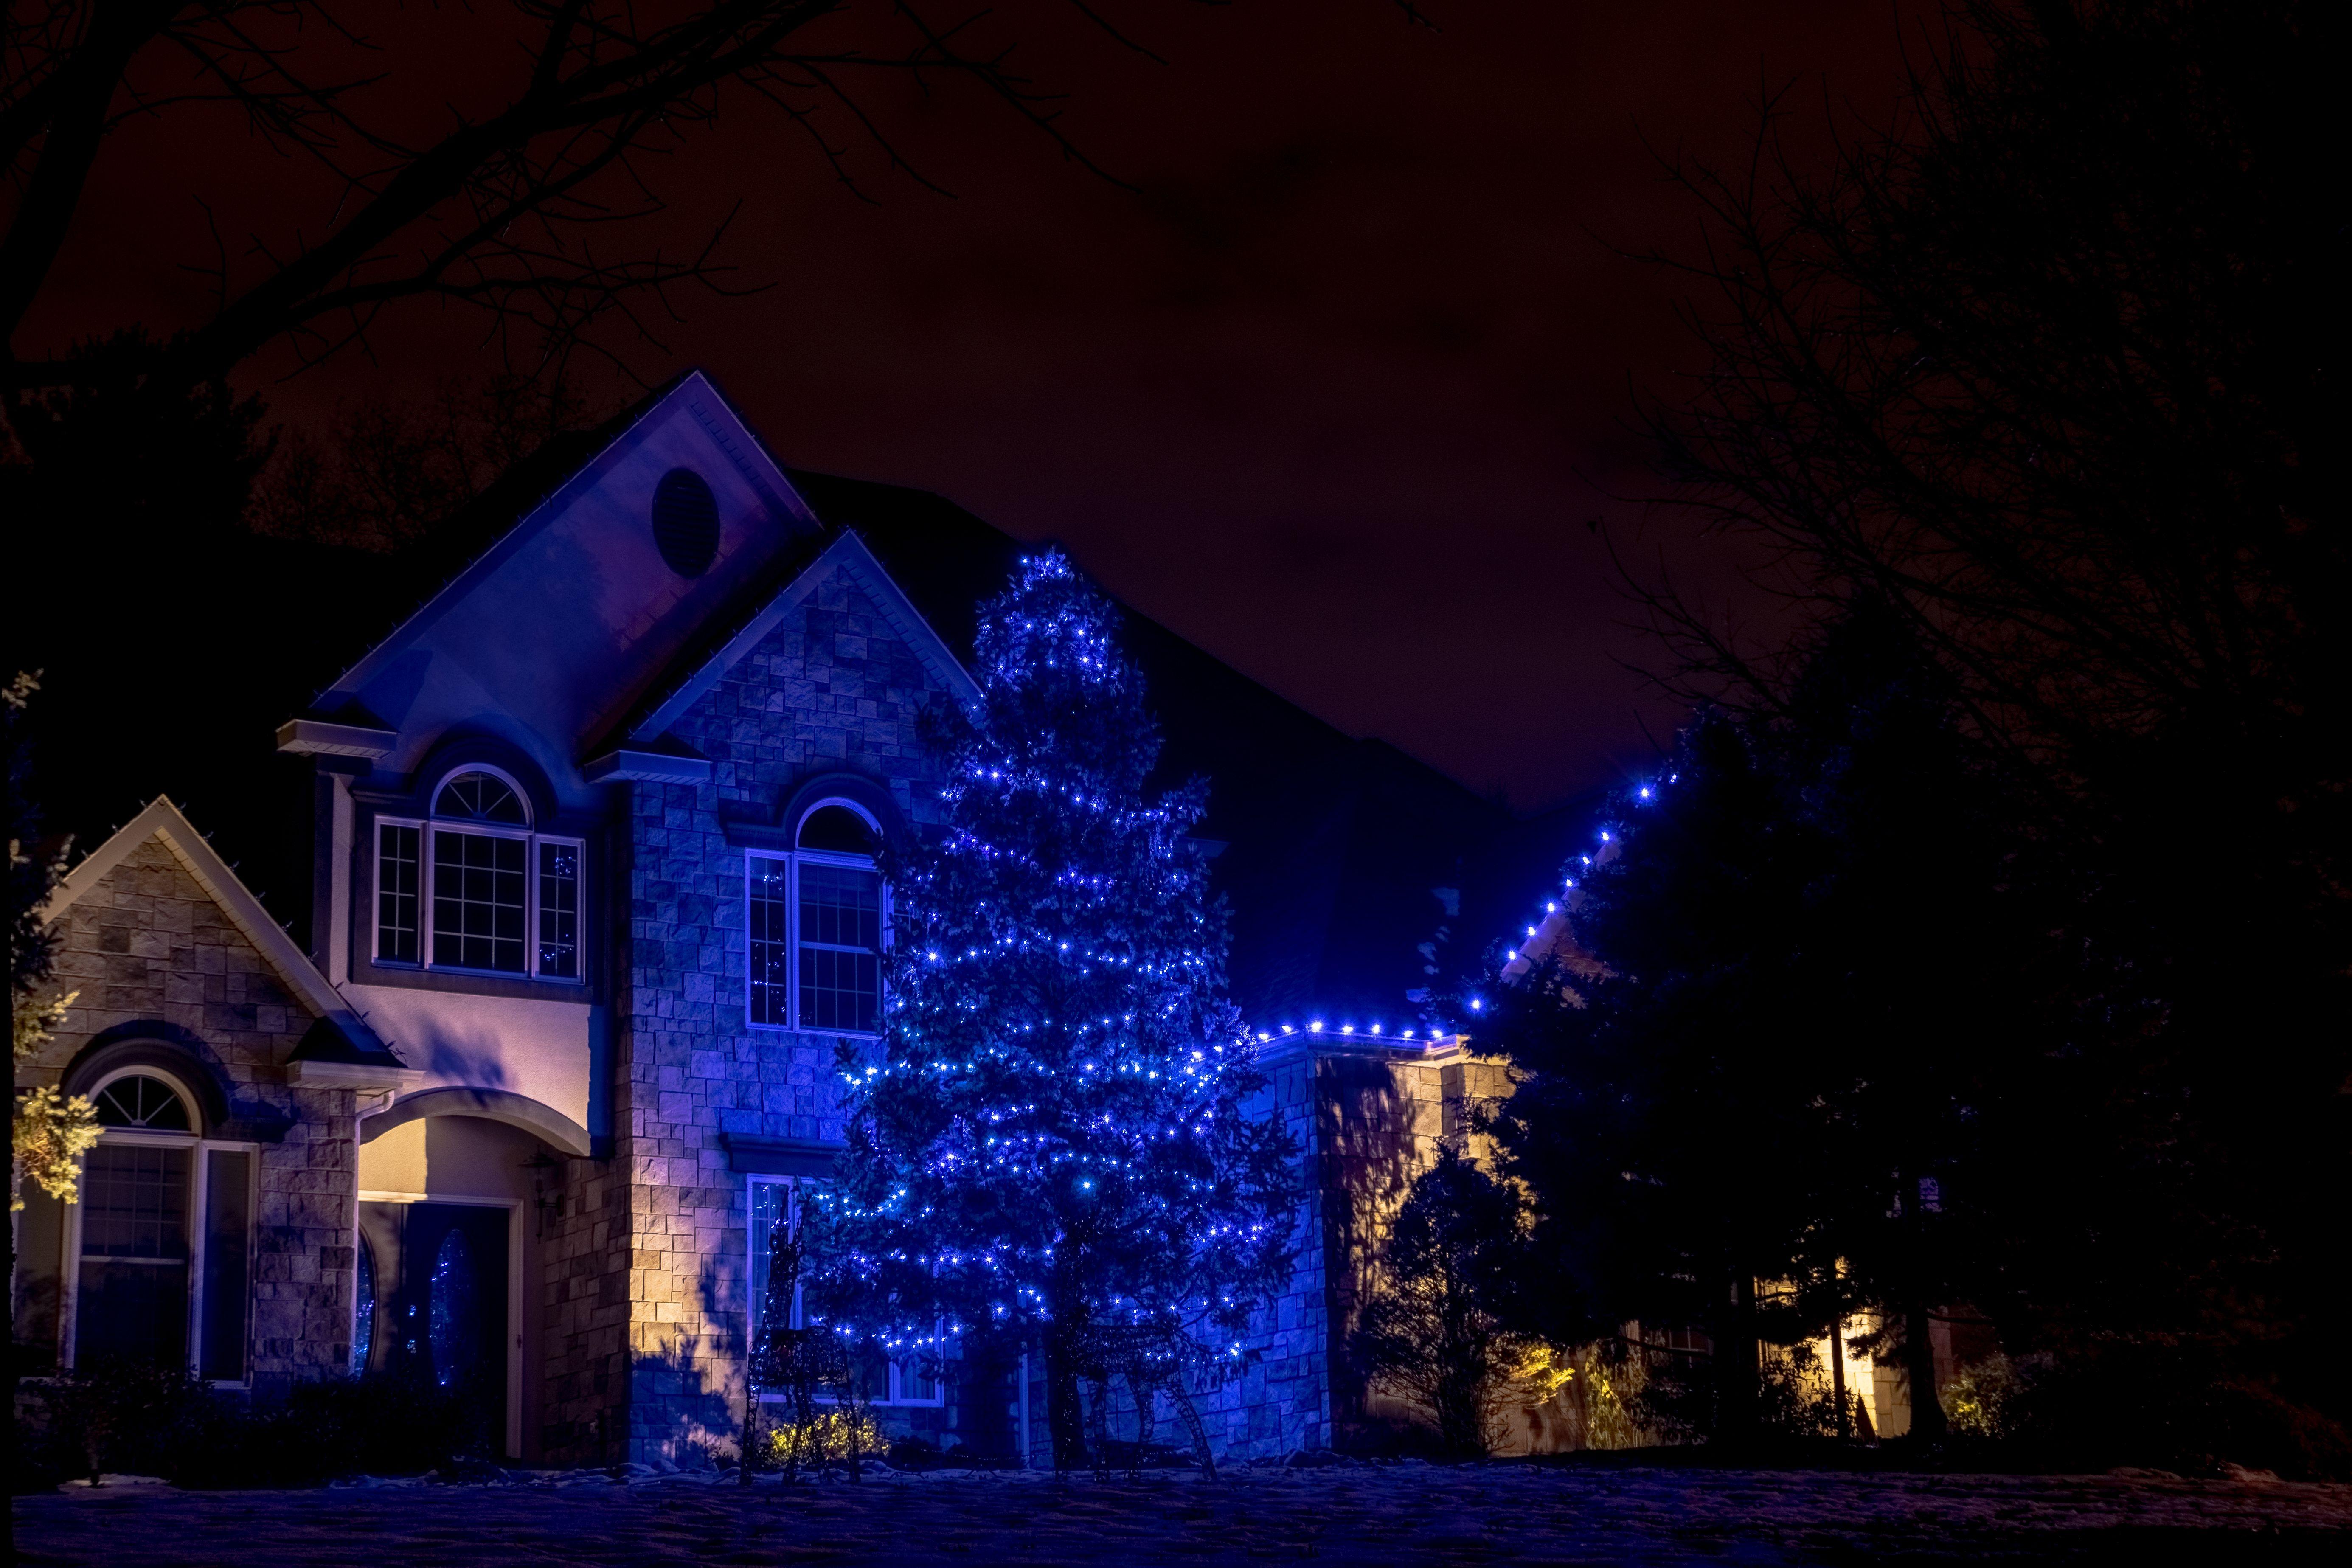 Decorating With Blue Led Christmas Lights Led Christmas Lights Exterior Christmas Lights Christmas Light Installation